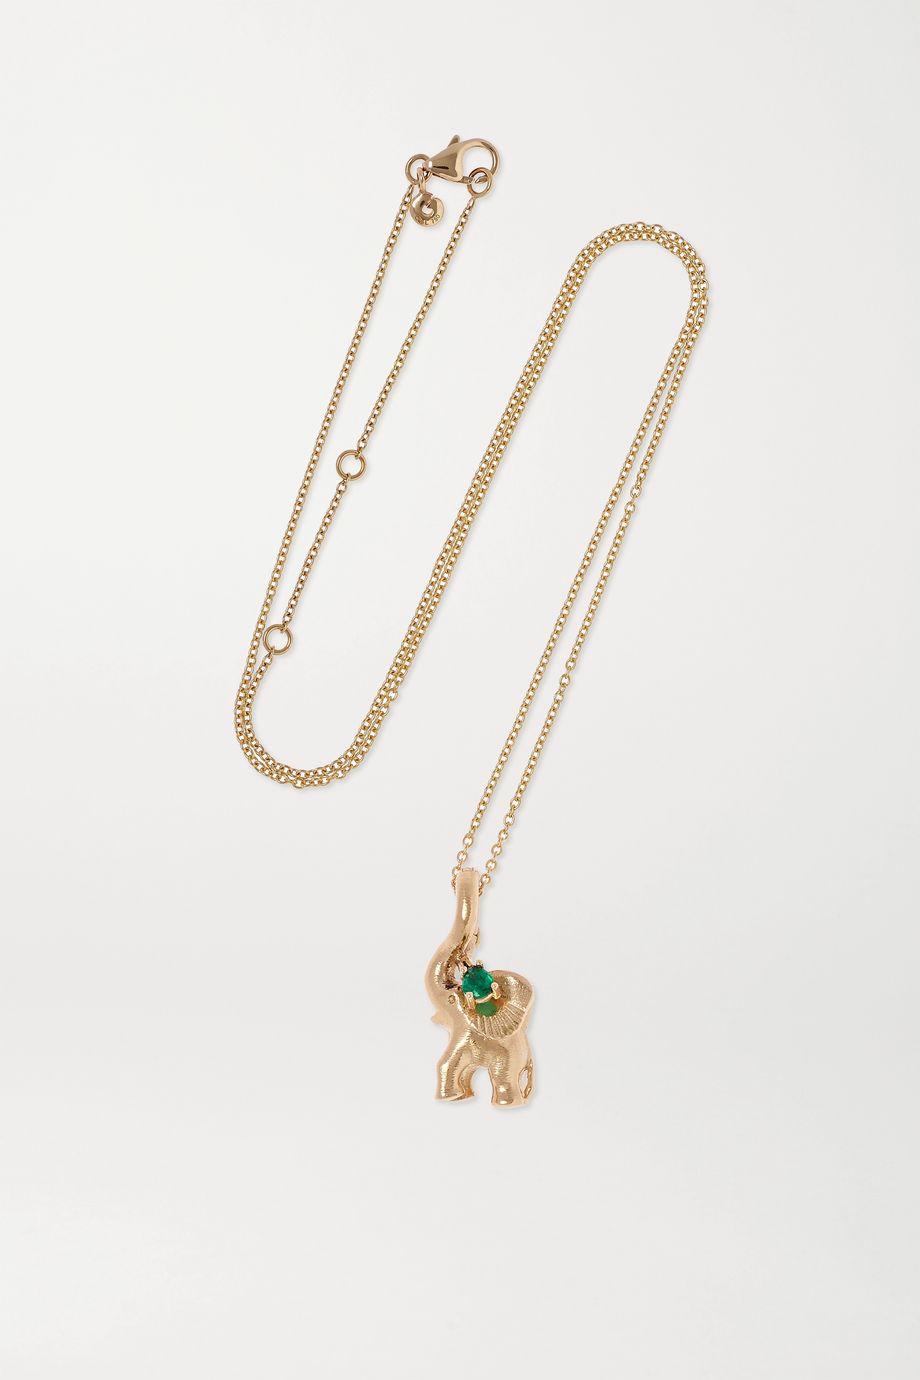 OLE LYNGGAARD COPENHAGEN + Space For Giants Sweet Drops 18-karat gold emerald necklace